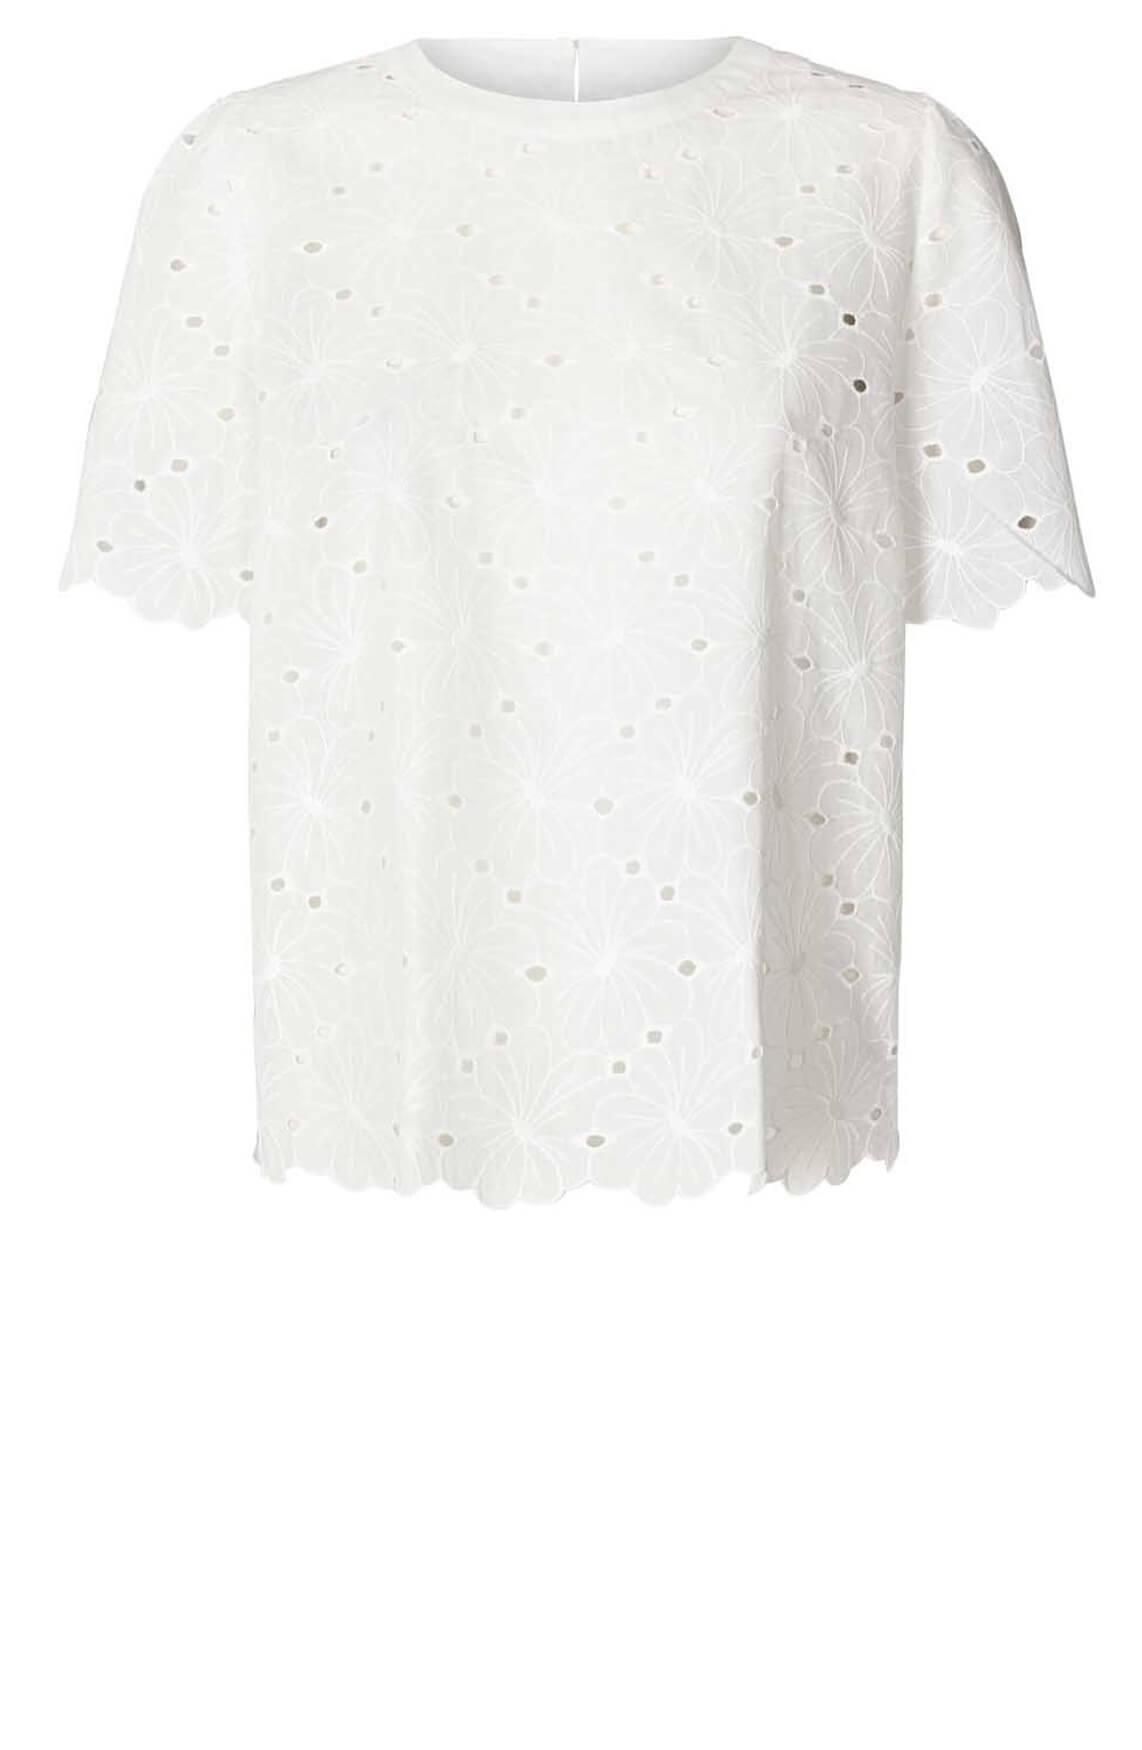 Lollys Laundry Dames Christina blouse wit